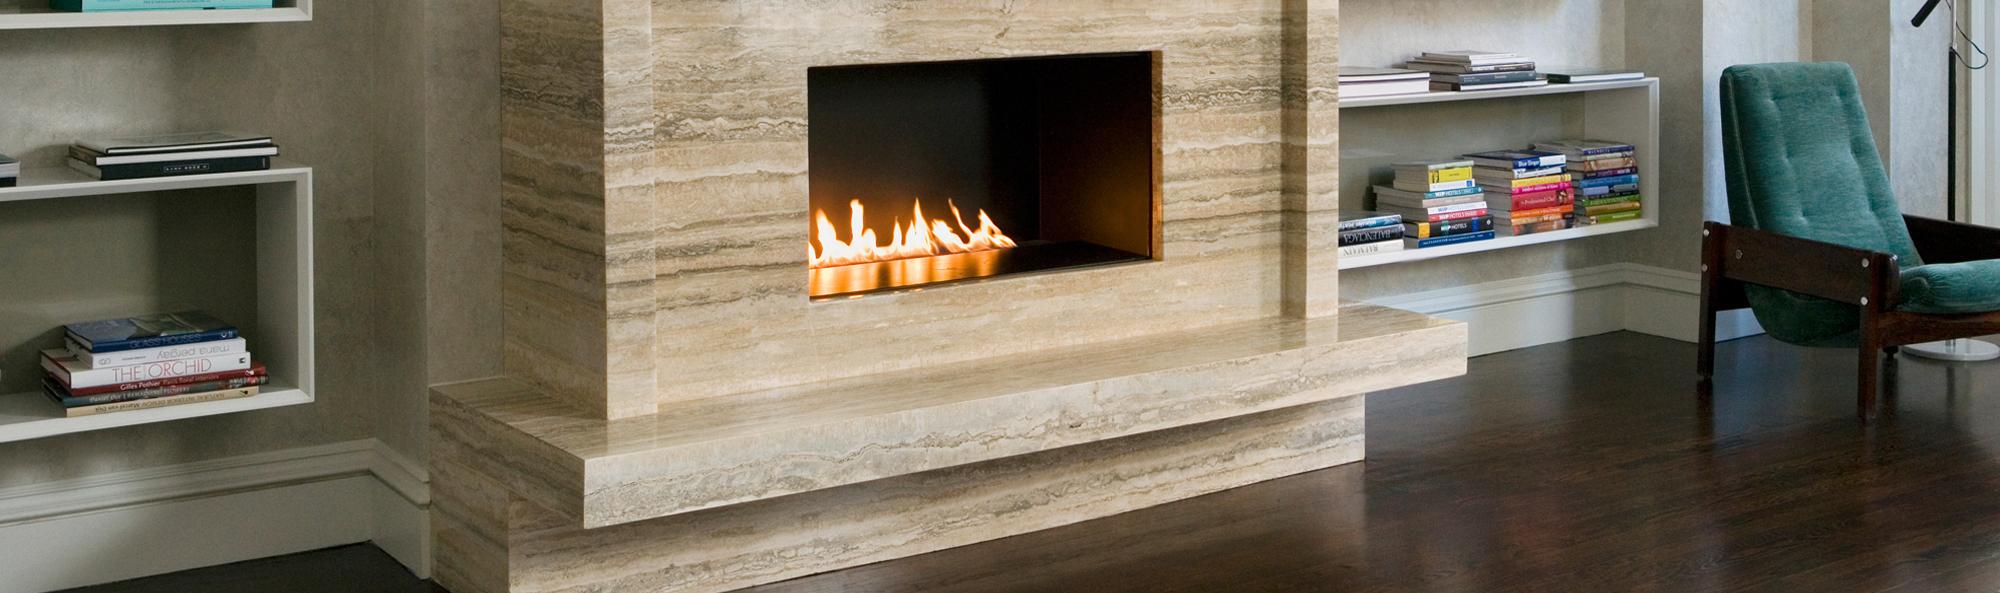 spark specifications spark modern fires